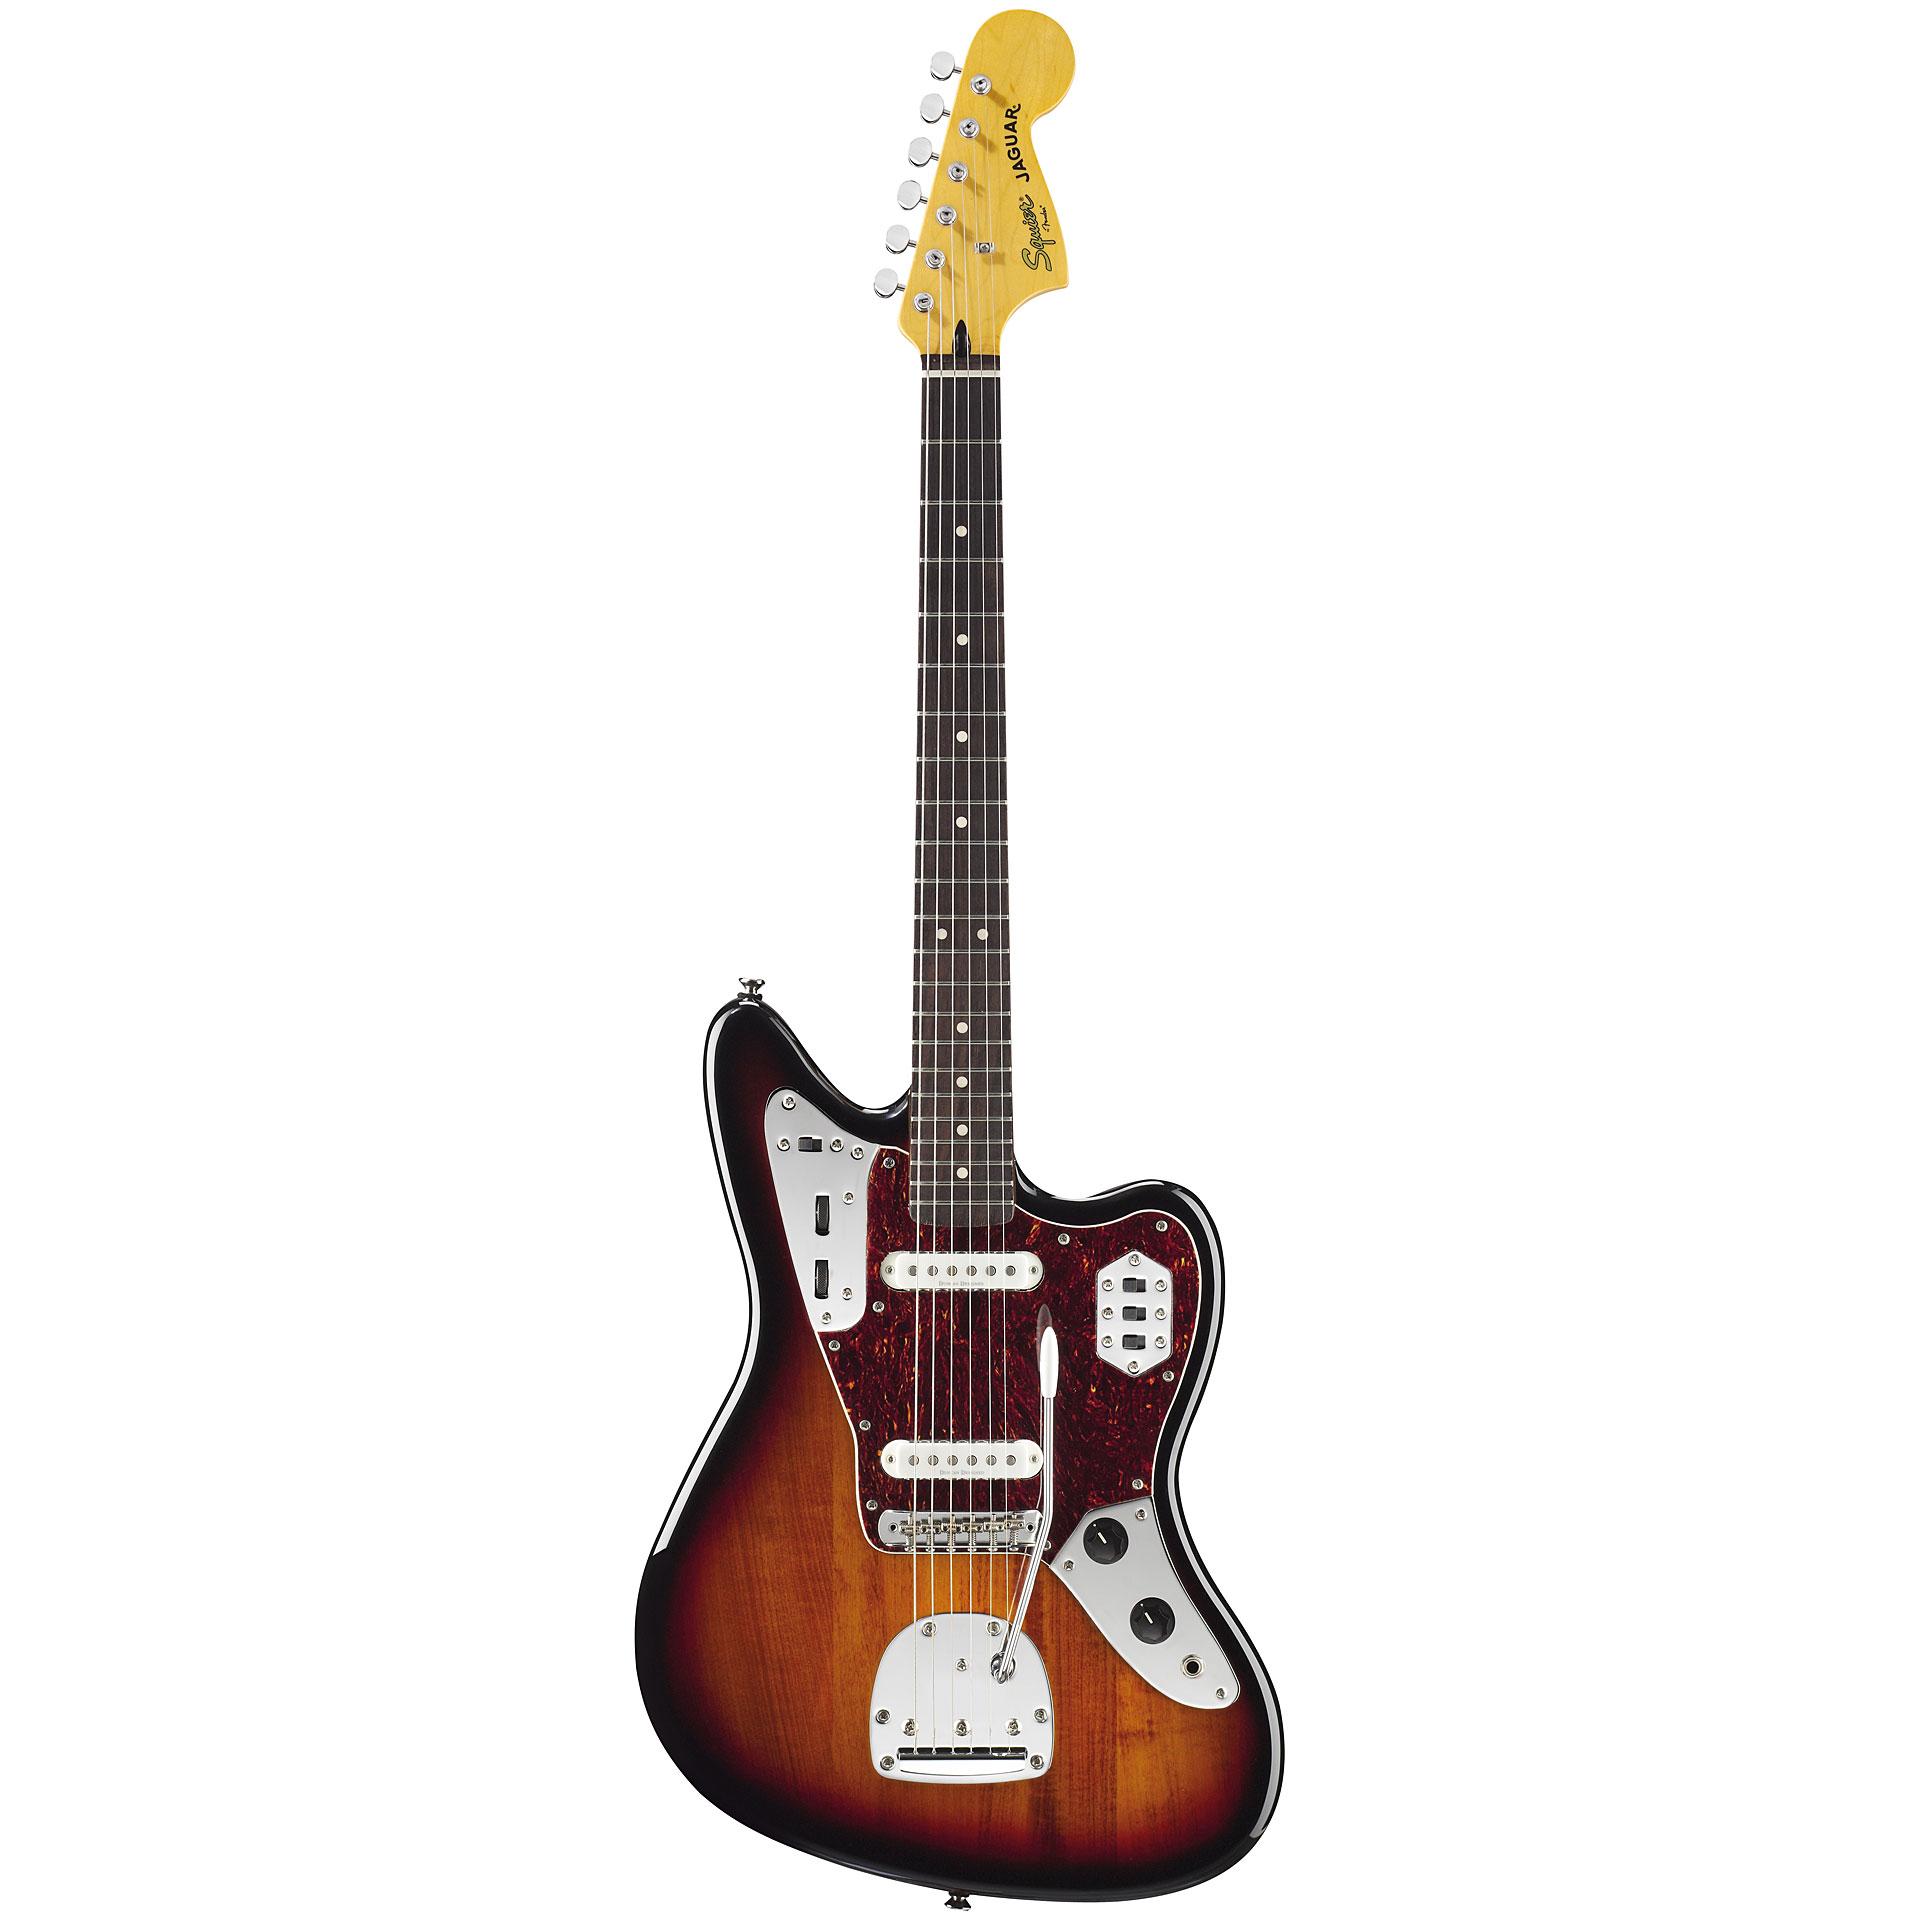 squier vintage modified jaguar sc 3tsb electric guitar. Black Bedroom Furniture Sets. Home Design Ideas